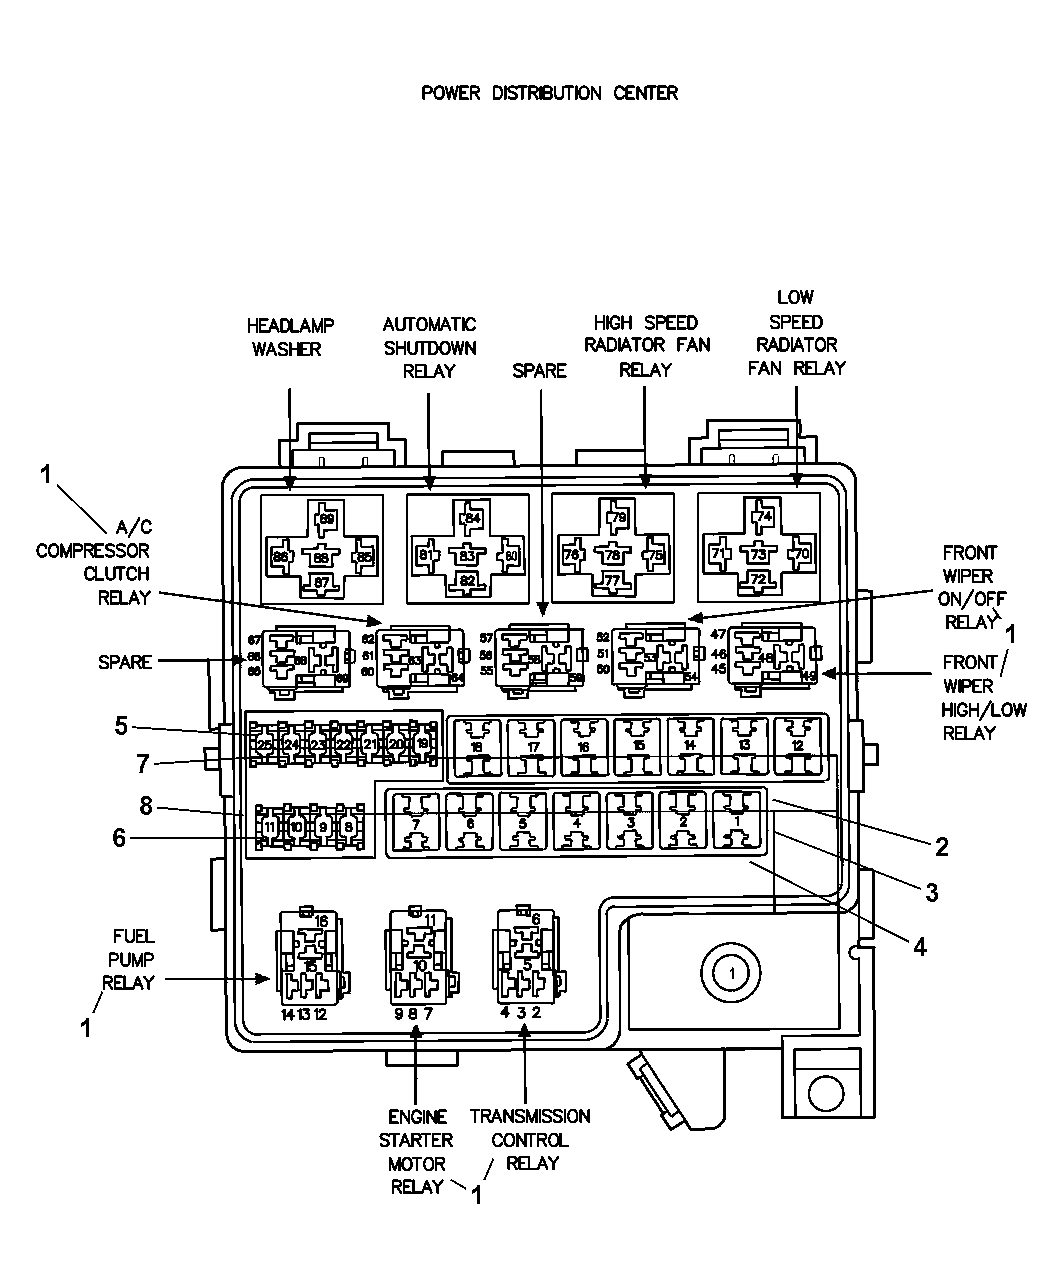 2010 Chrysler Engine Diagram Wiring Library